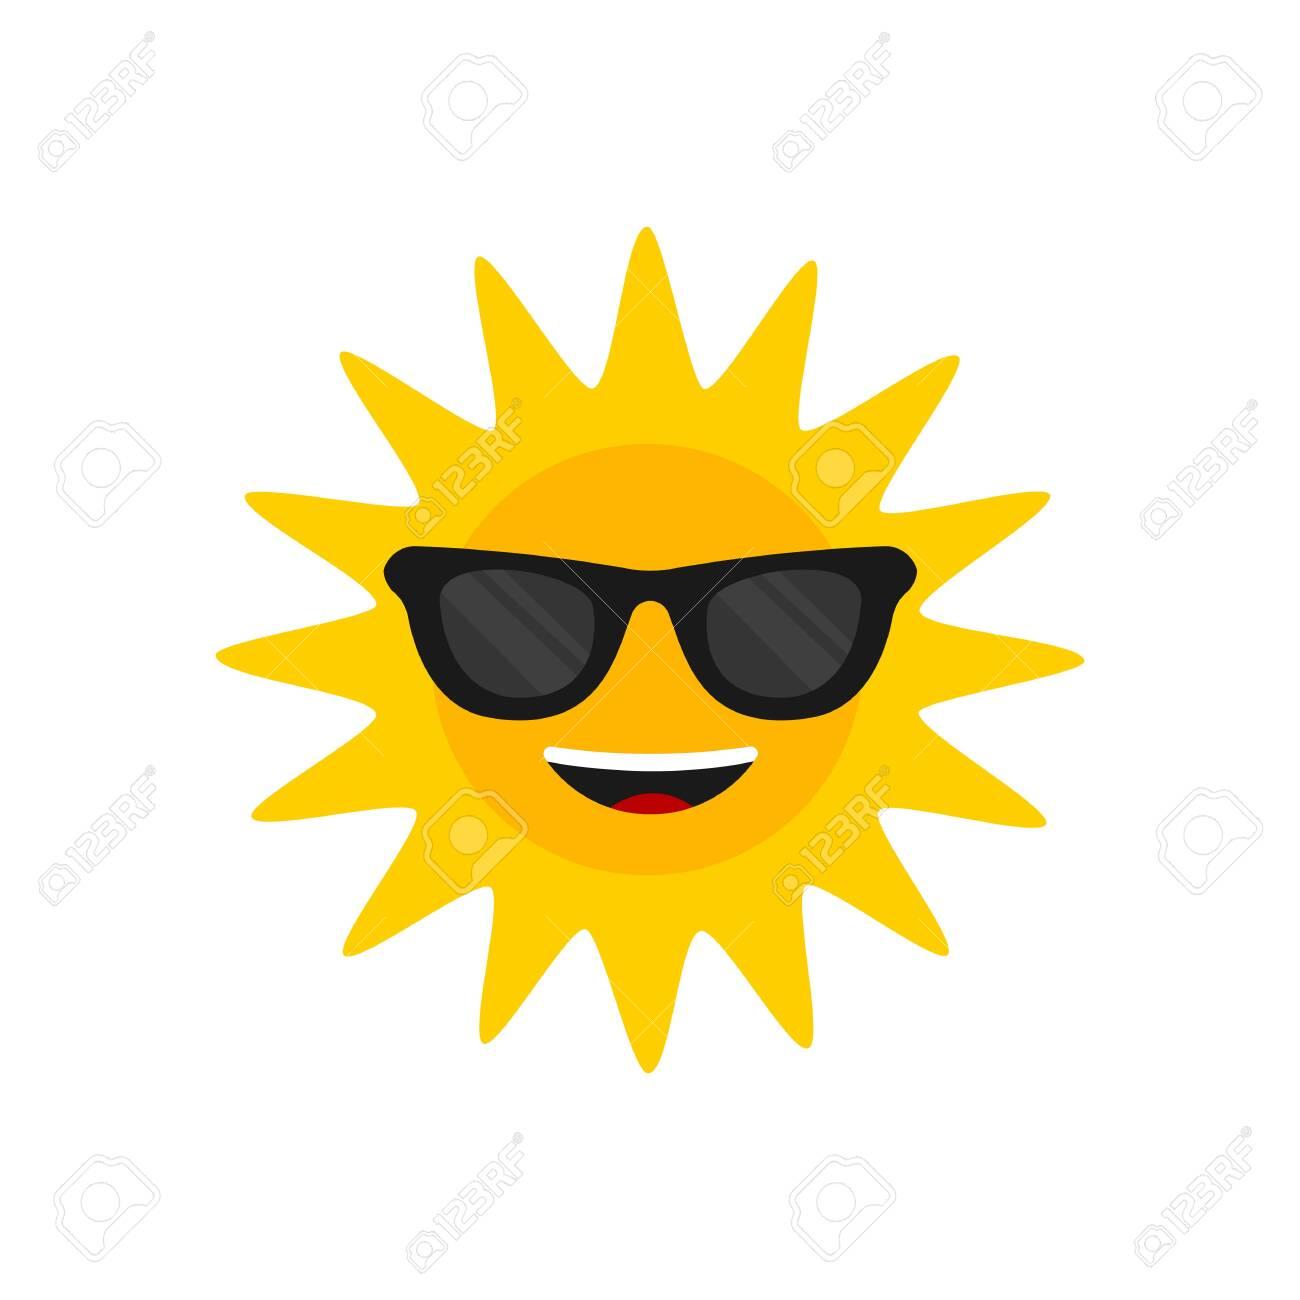 Sun with sunglasses. Cartoon smiling sun icon for weather design. Sunshine symbol happy orange isolated sun vector illustration - 157094102